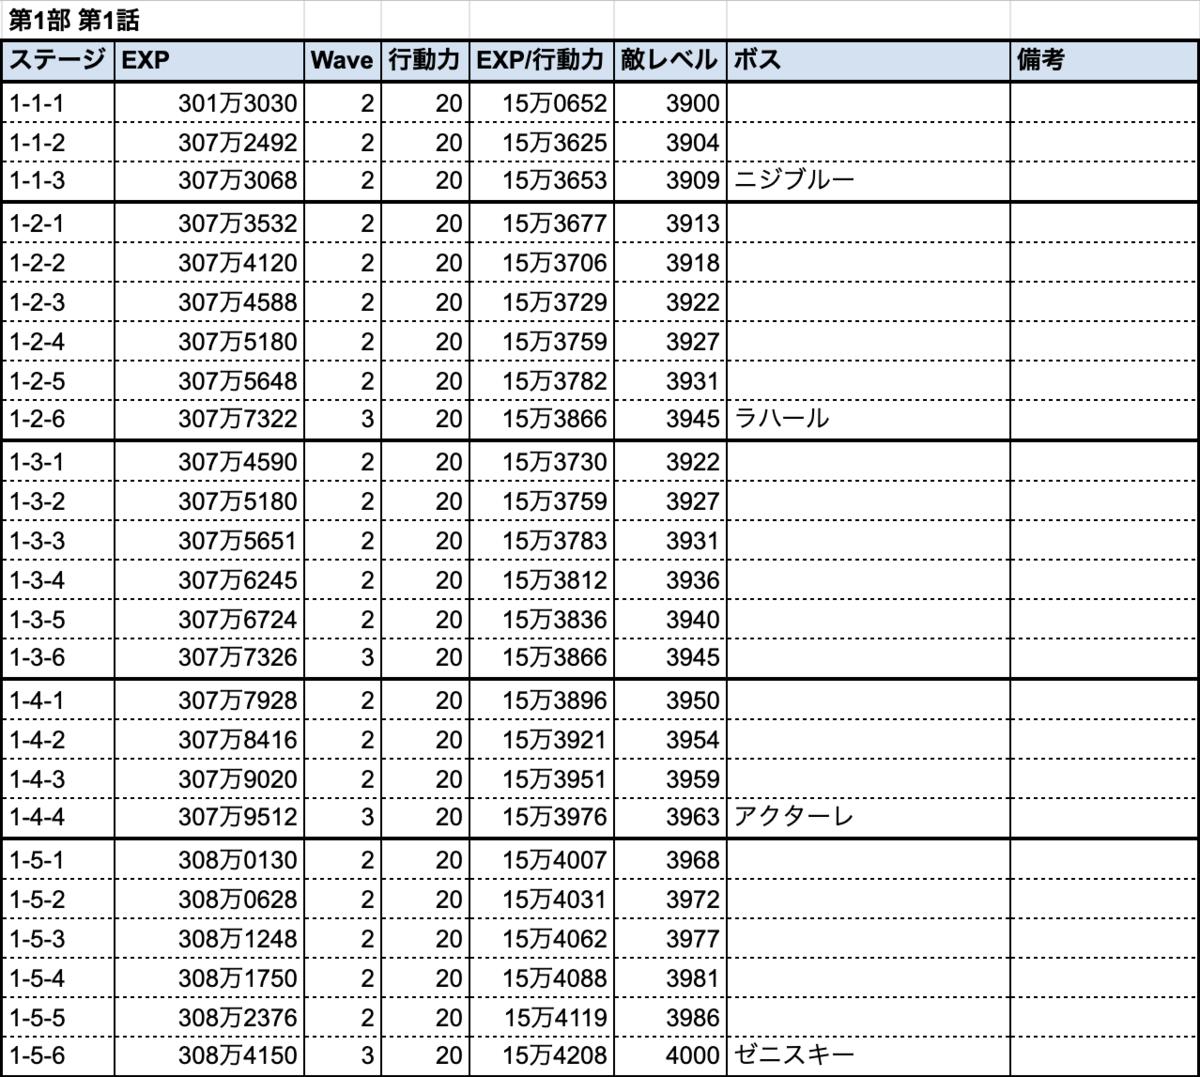 f:id:Yoshitaka-0922:20200719215117p:plain